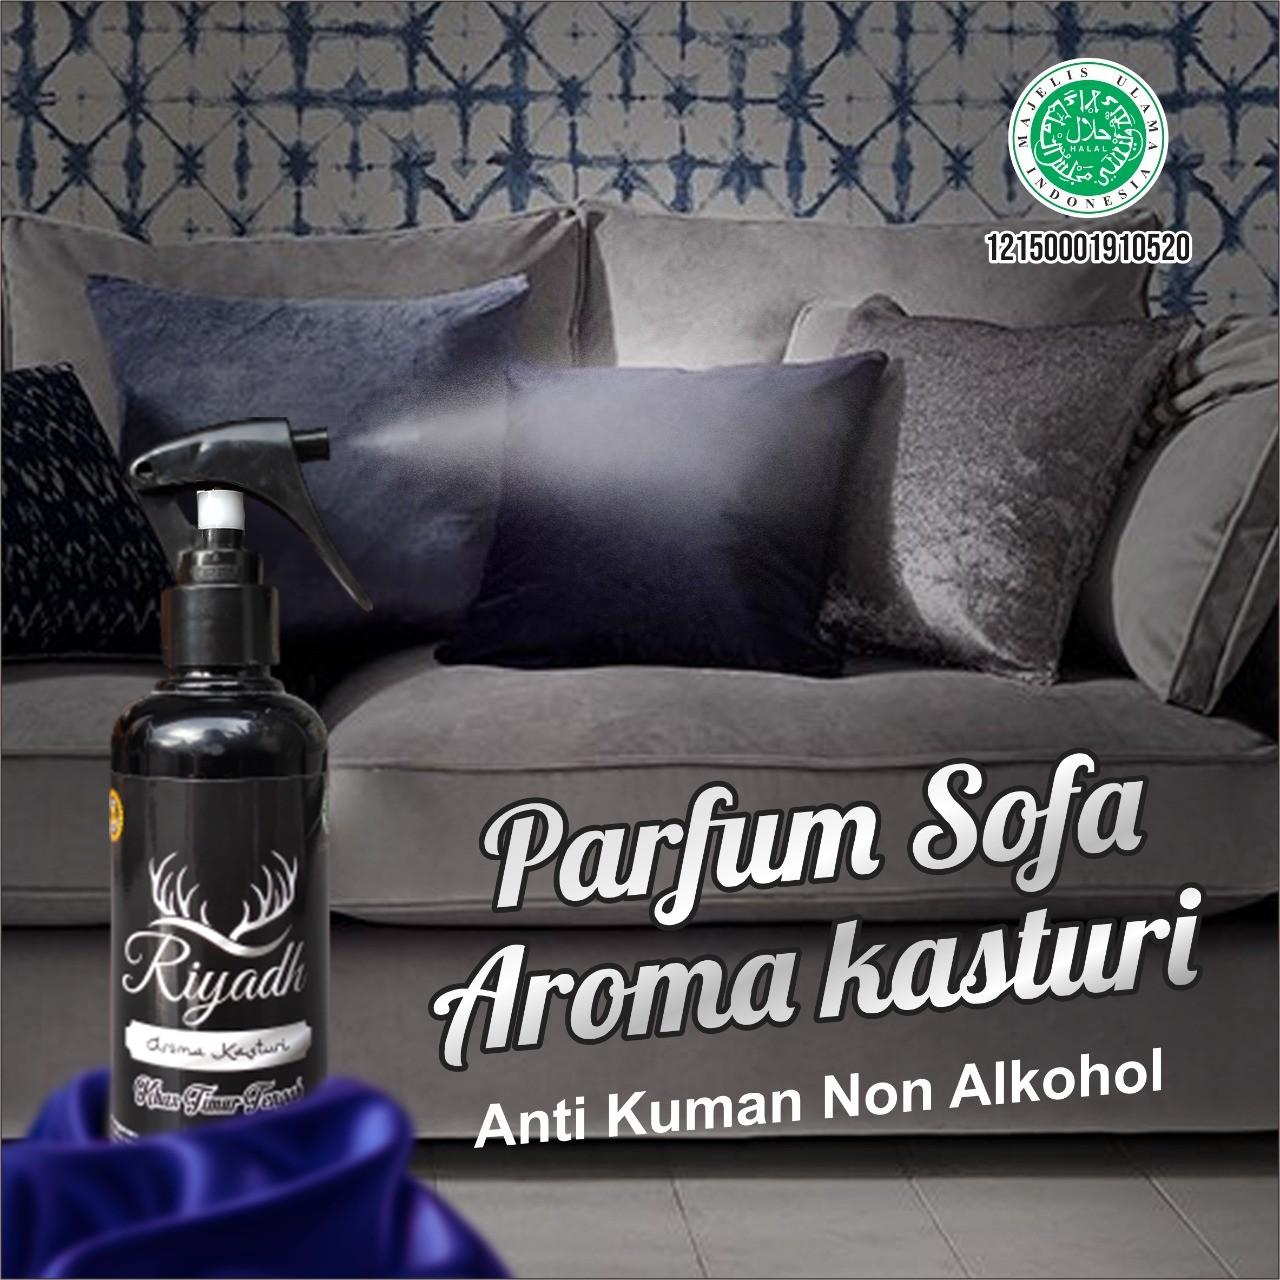 Parfum Sofa Aroma Kasturi